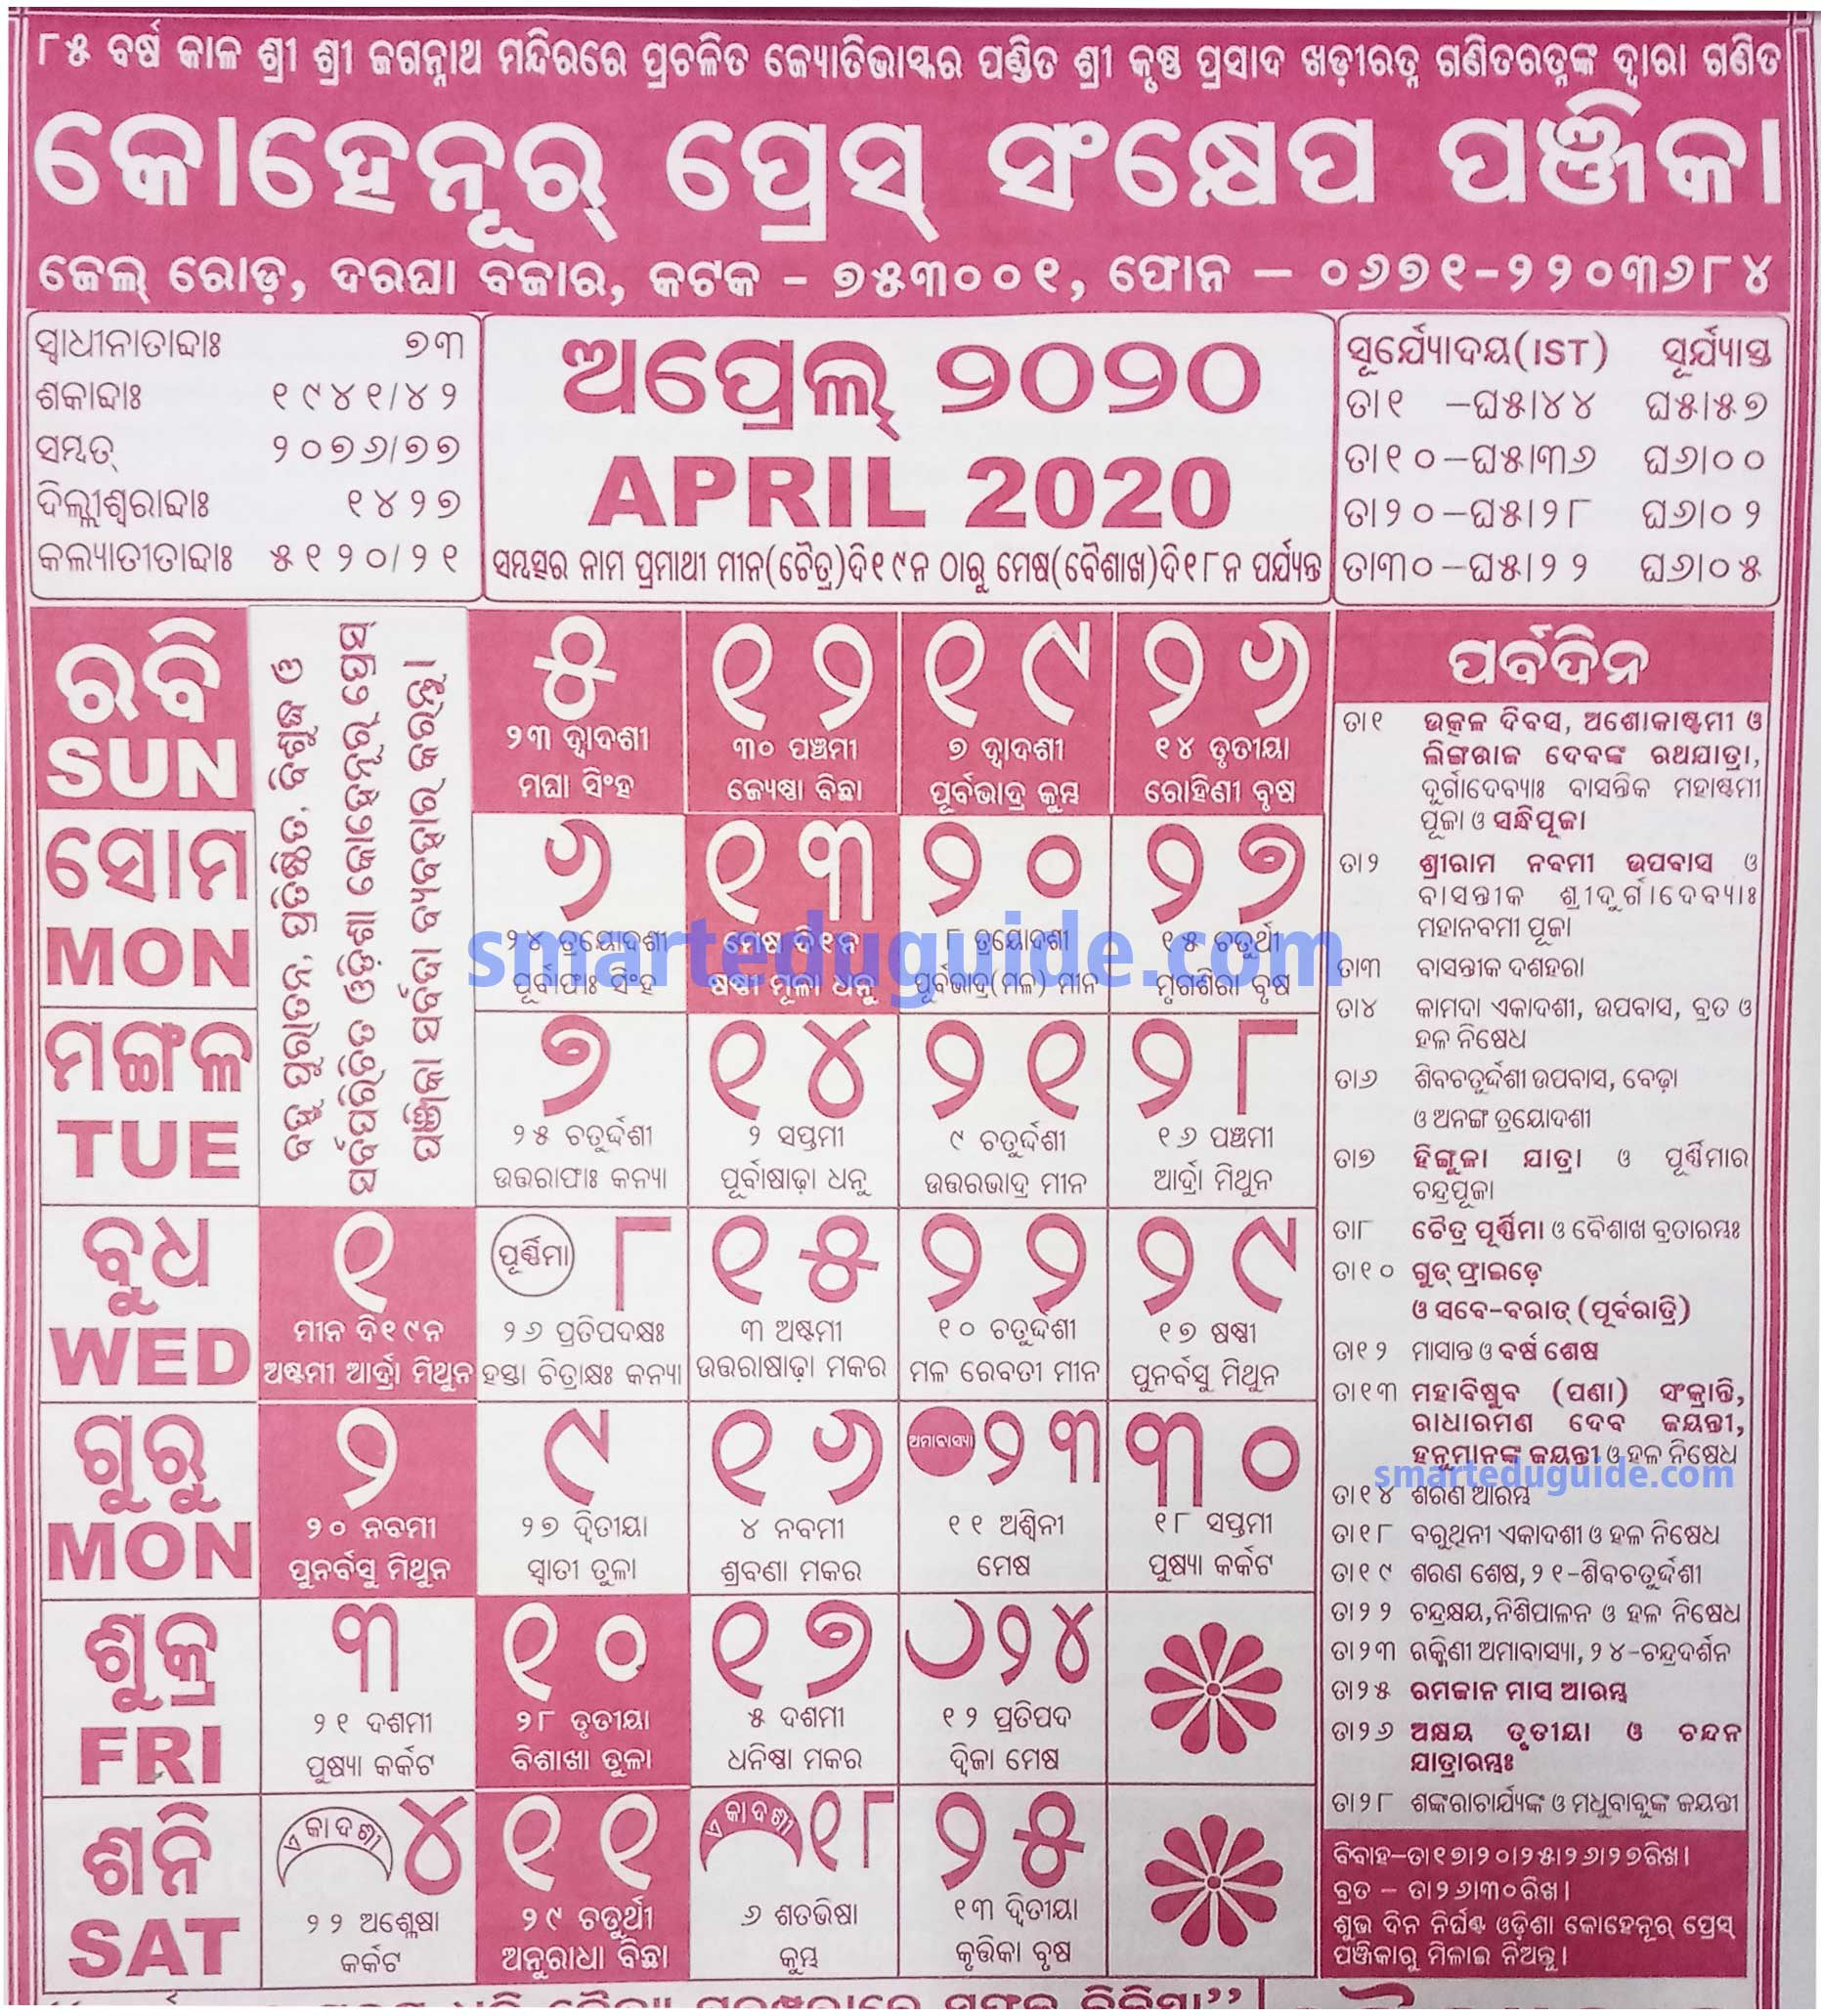 Odia Kohinoor Calendar 2020 April | Odishain throughout Odia Calendar January 2020